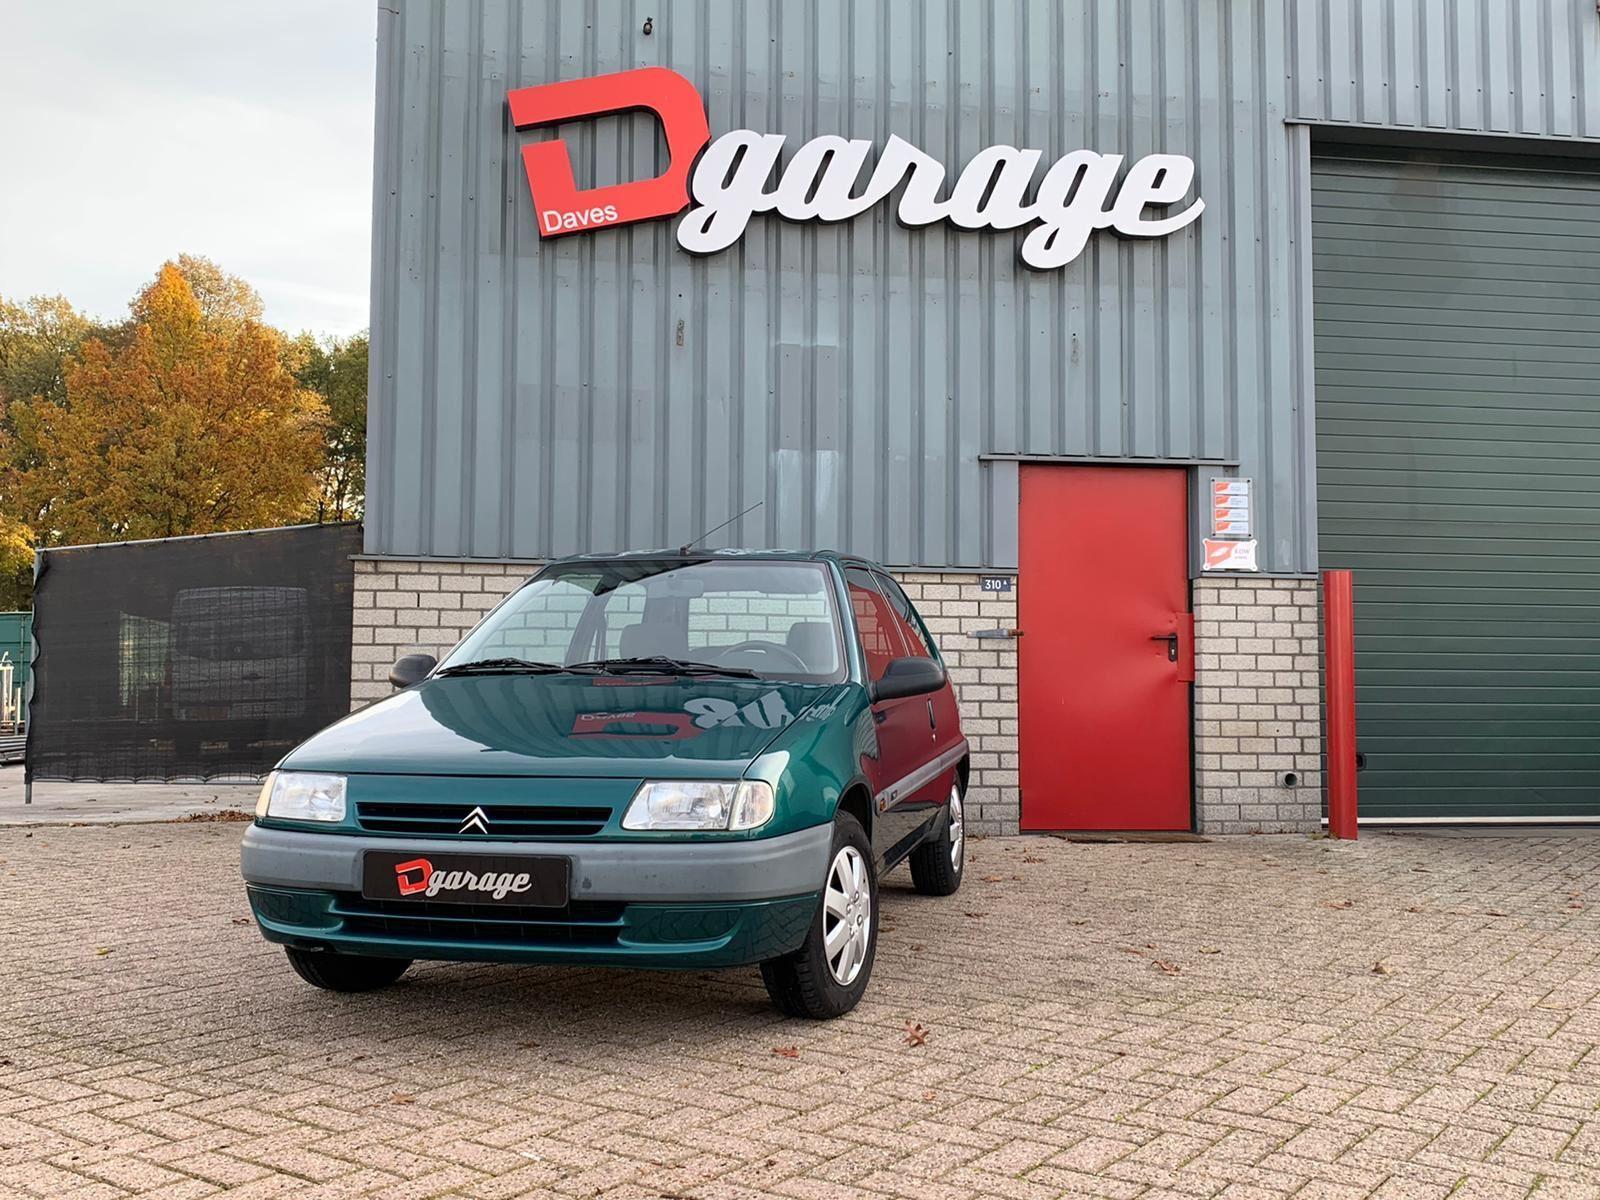 Citroen Saxo occasion - Dave's Garage